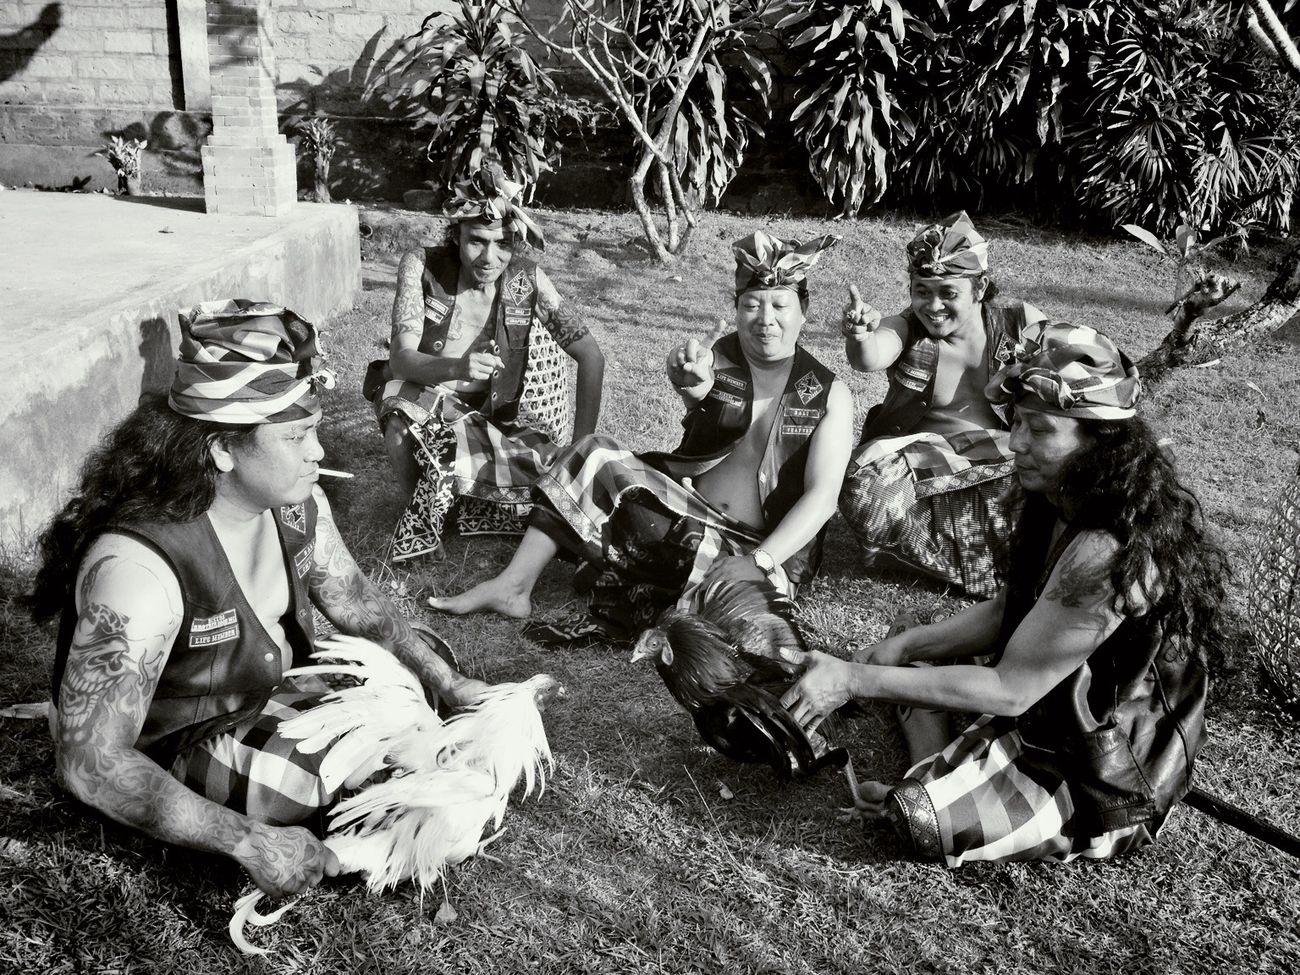 Bikers juga manusia I Love It ❤ Bikers Brotherhood Mc Motorcycle Club 1% INDONESIA Traditional Culture Bali chapter Brotherhood For Culture Hello World Enjoying Life